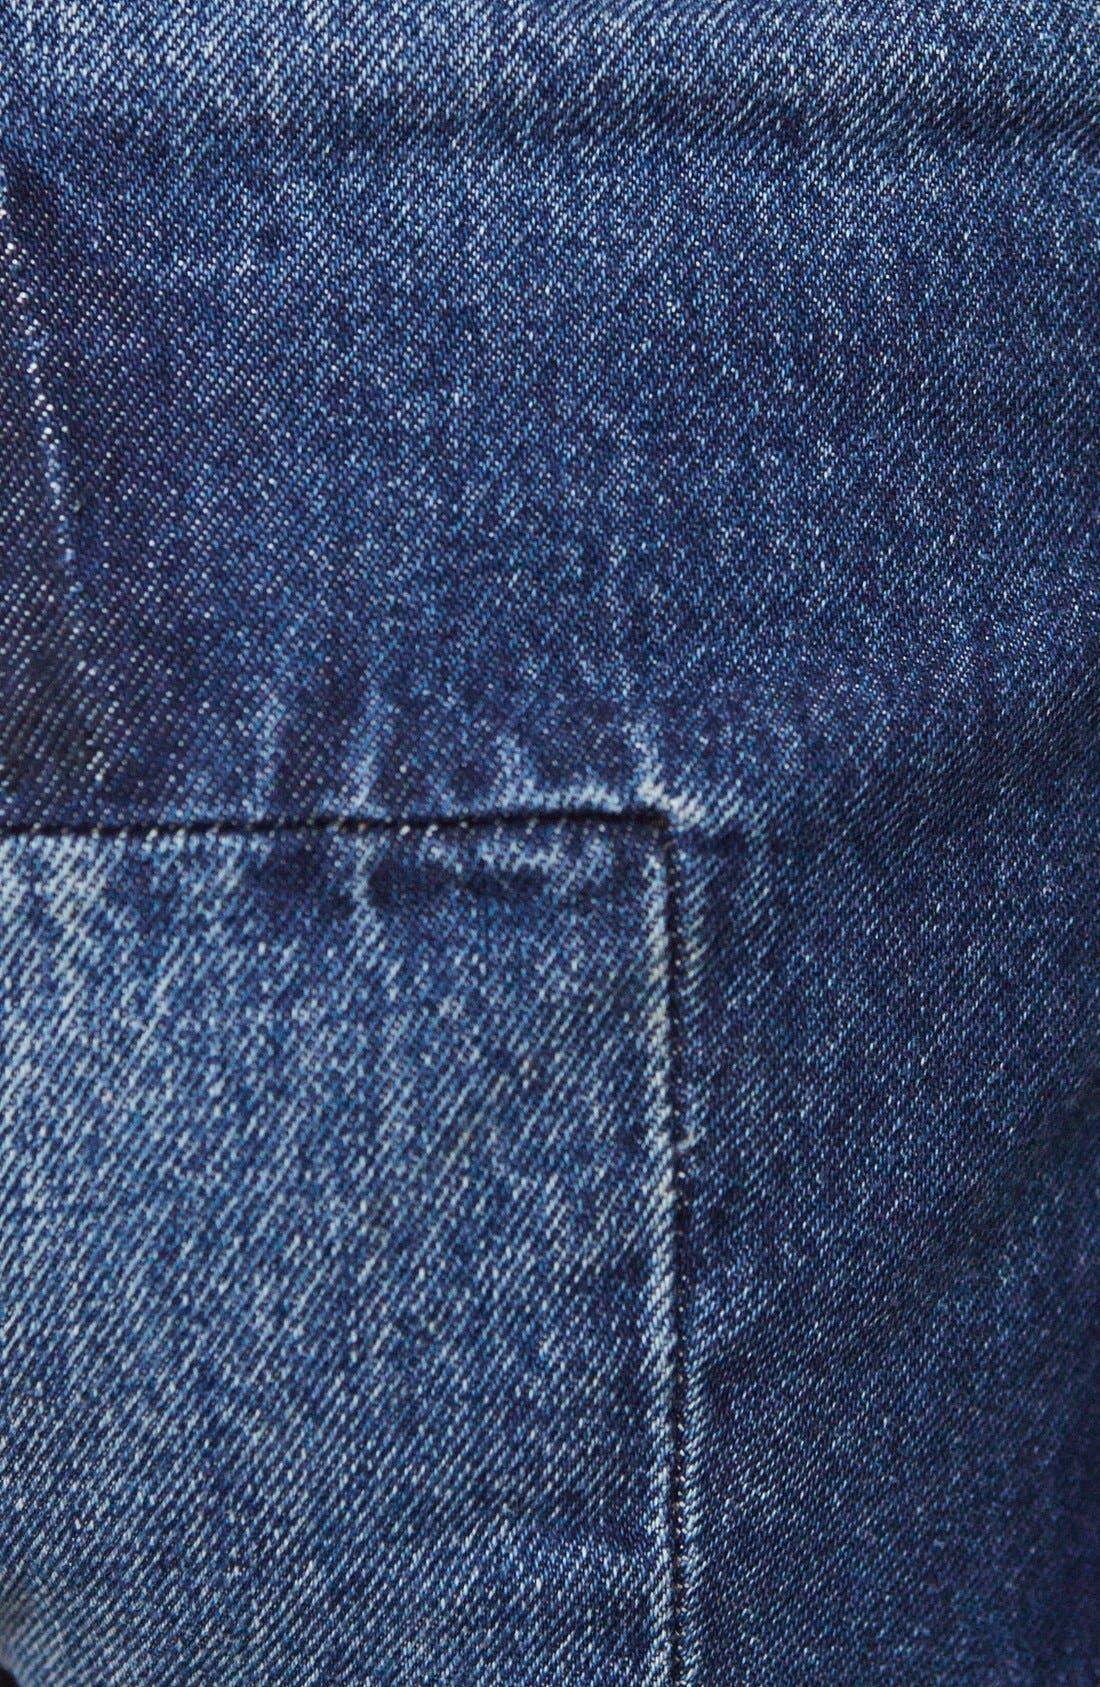 Alternate Image 3  - Vetements x Levi's® Denim Hot Pants